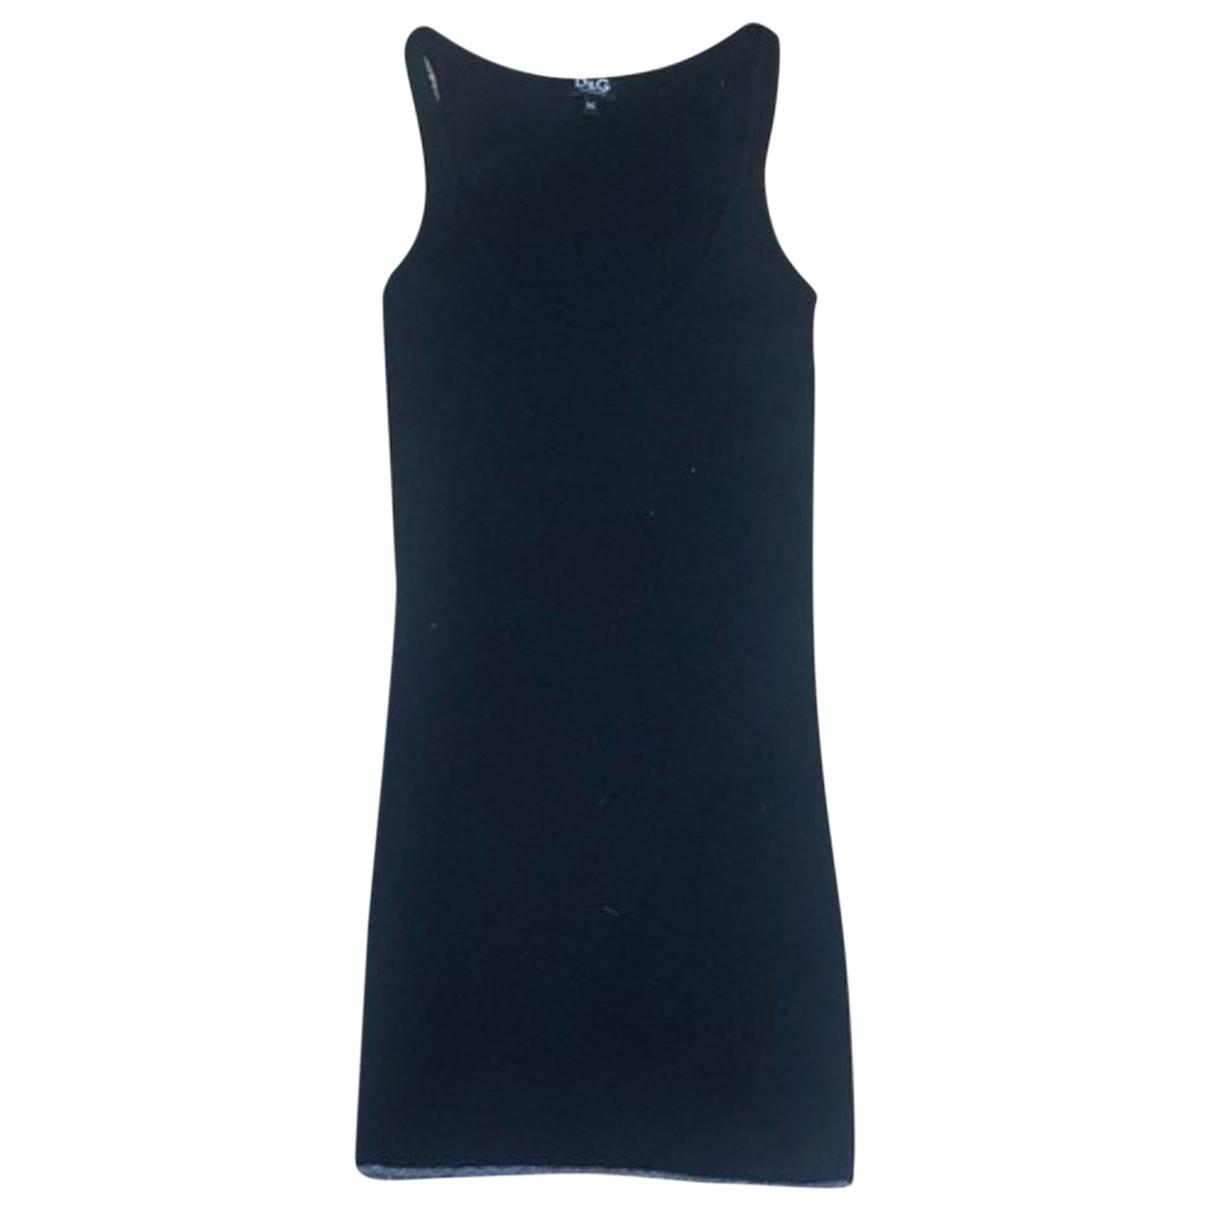 D&g \N Black Cashmere Knitwear for Women M International